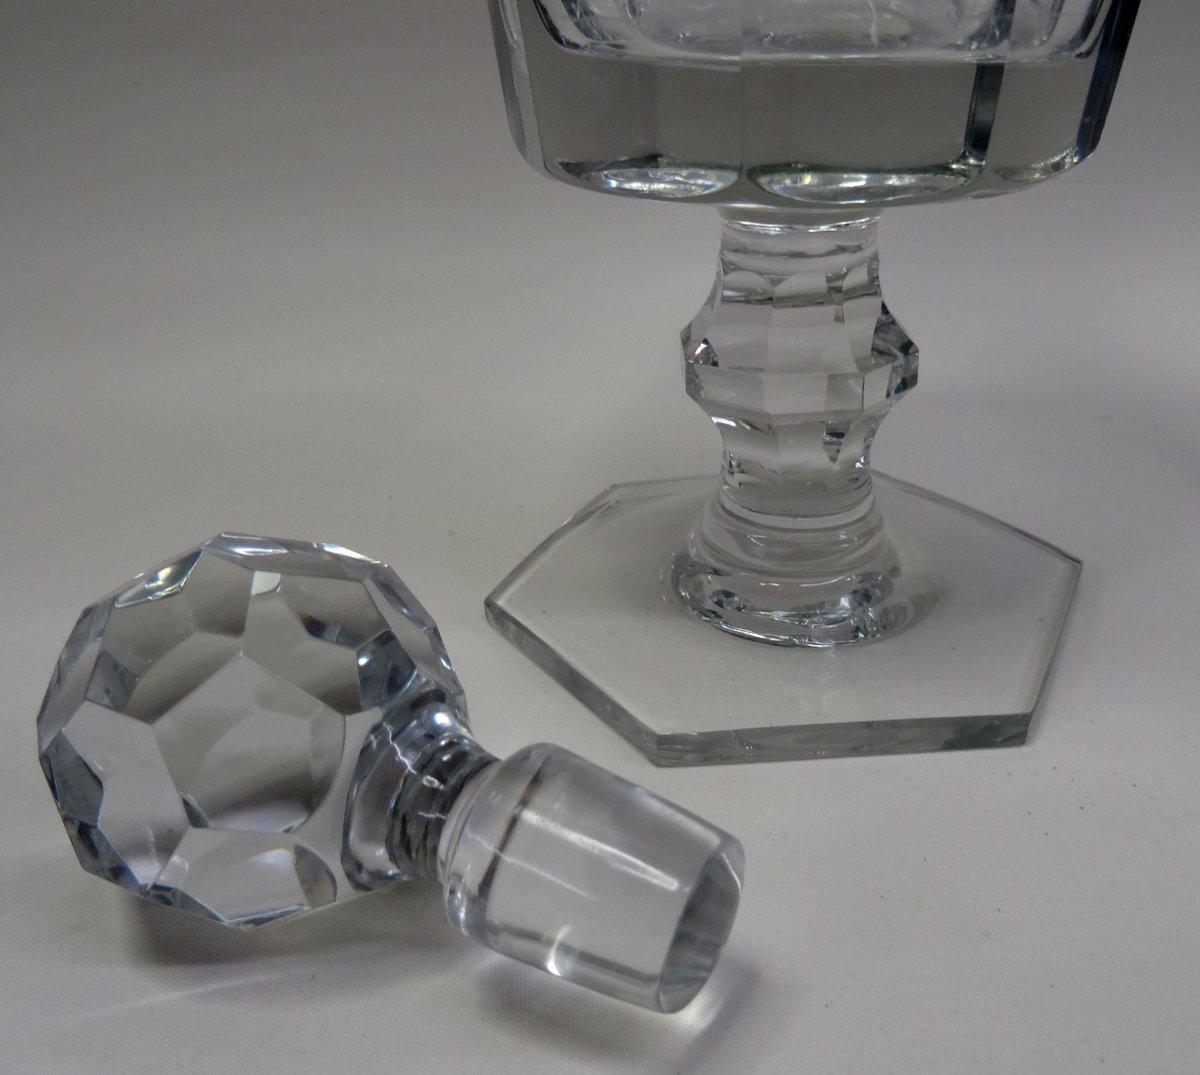 Exklusives Baccarat France Kristallglas geschliffene Likörglas Gold handgemalt